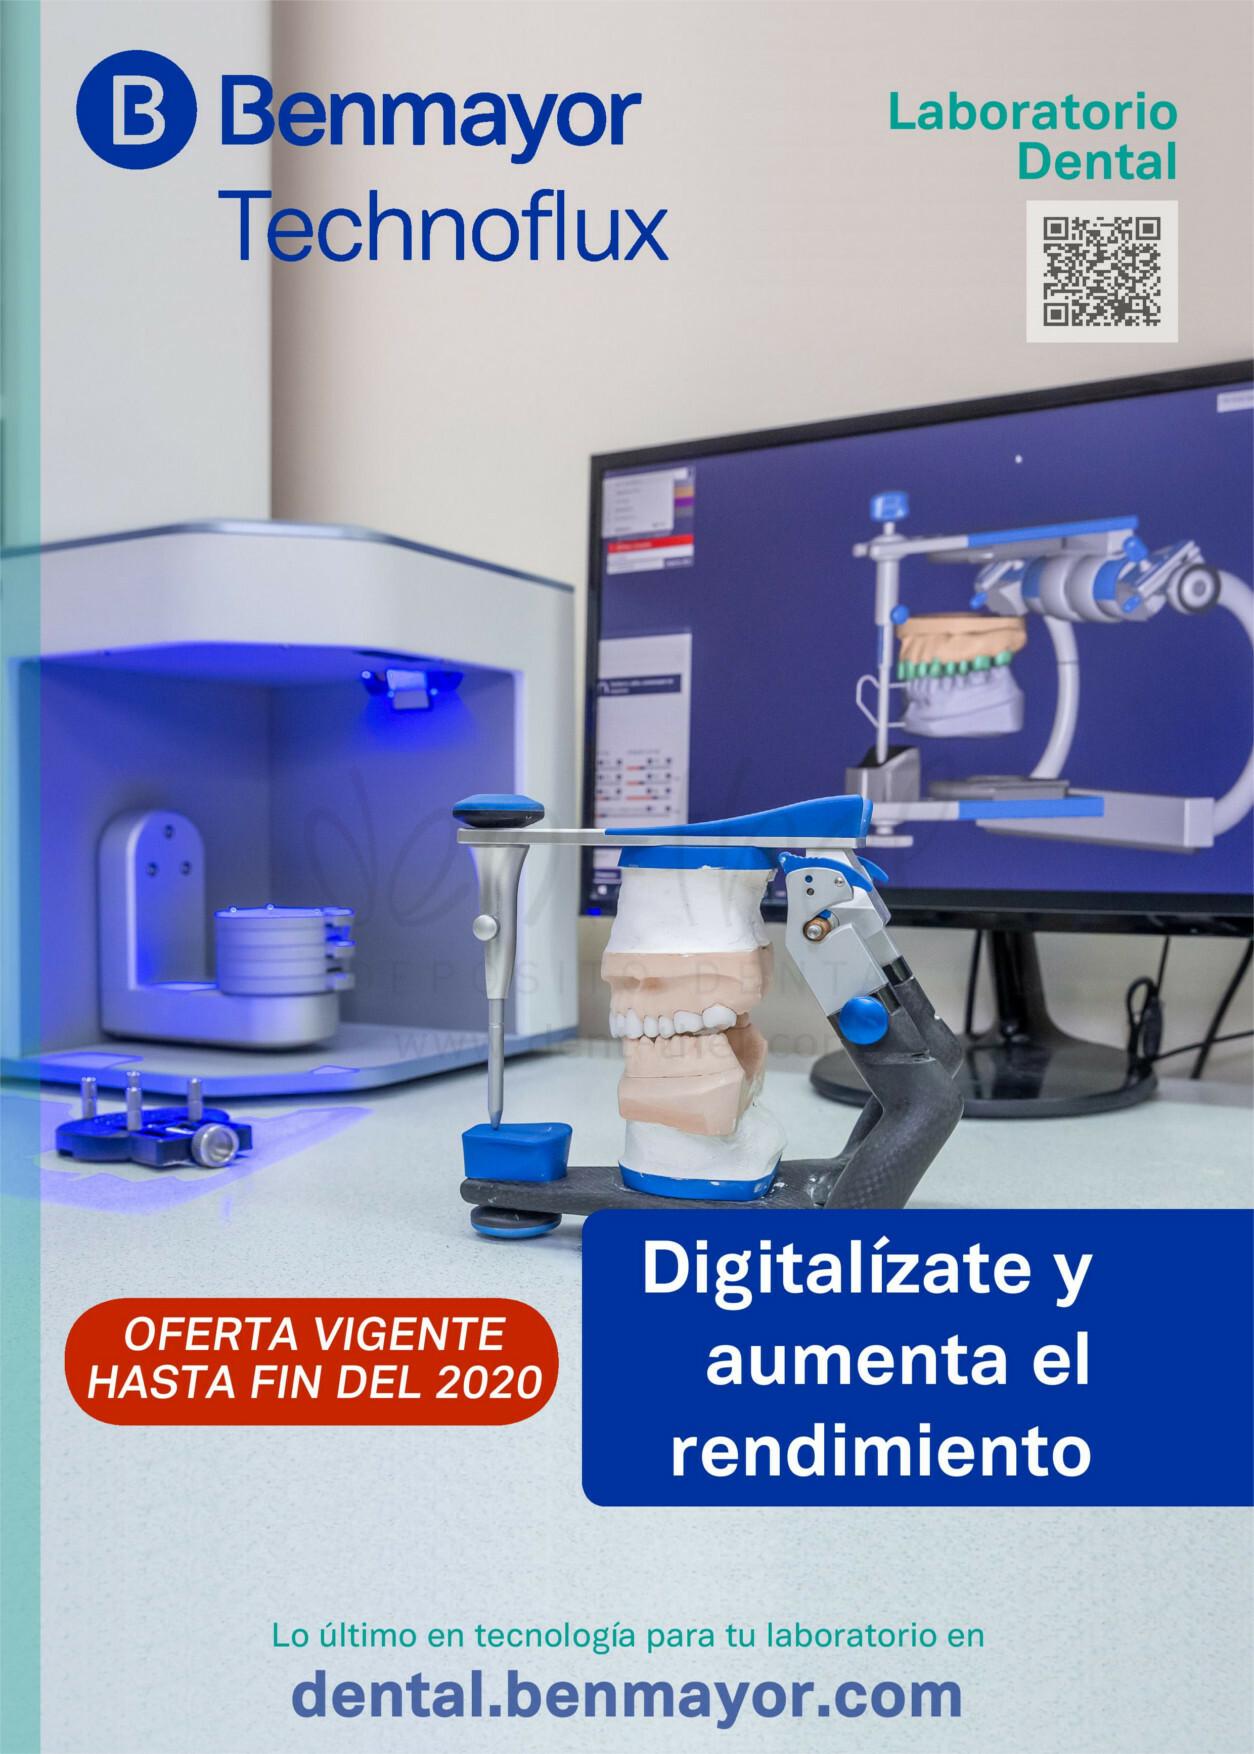 Ofertas Benmayor laboratorio